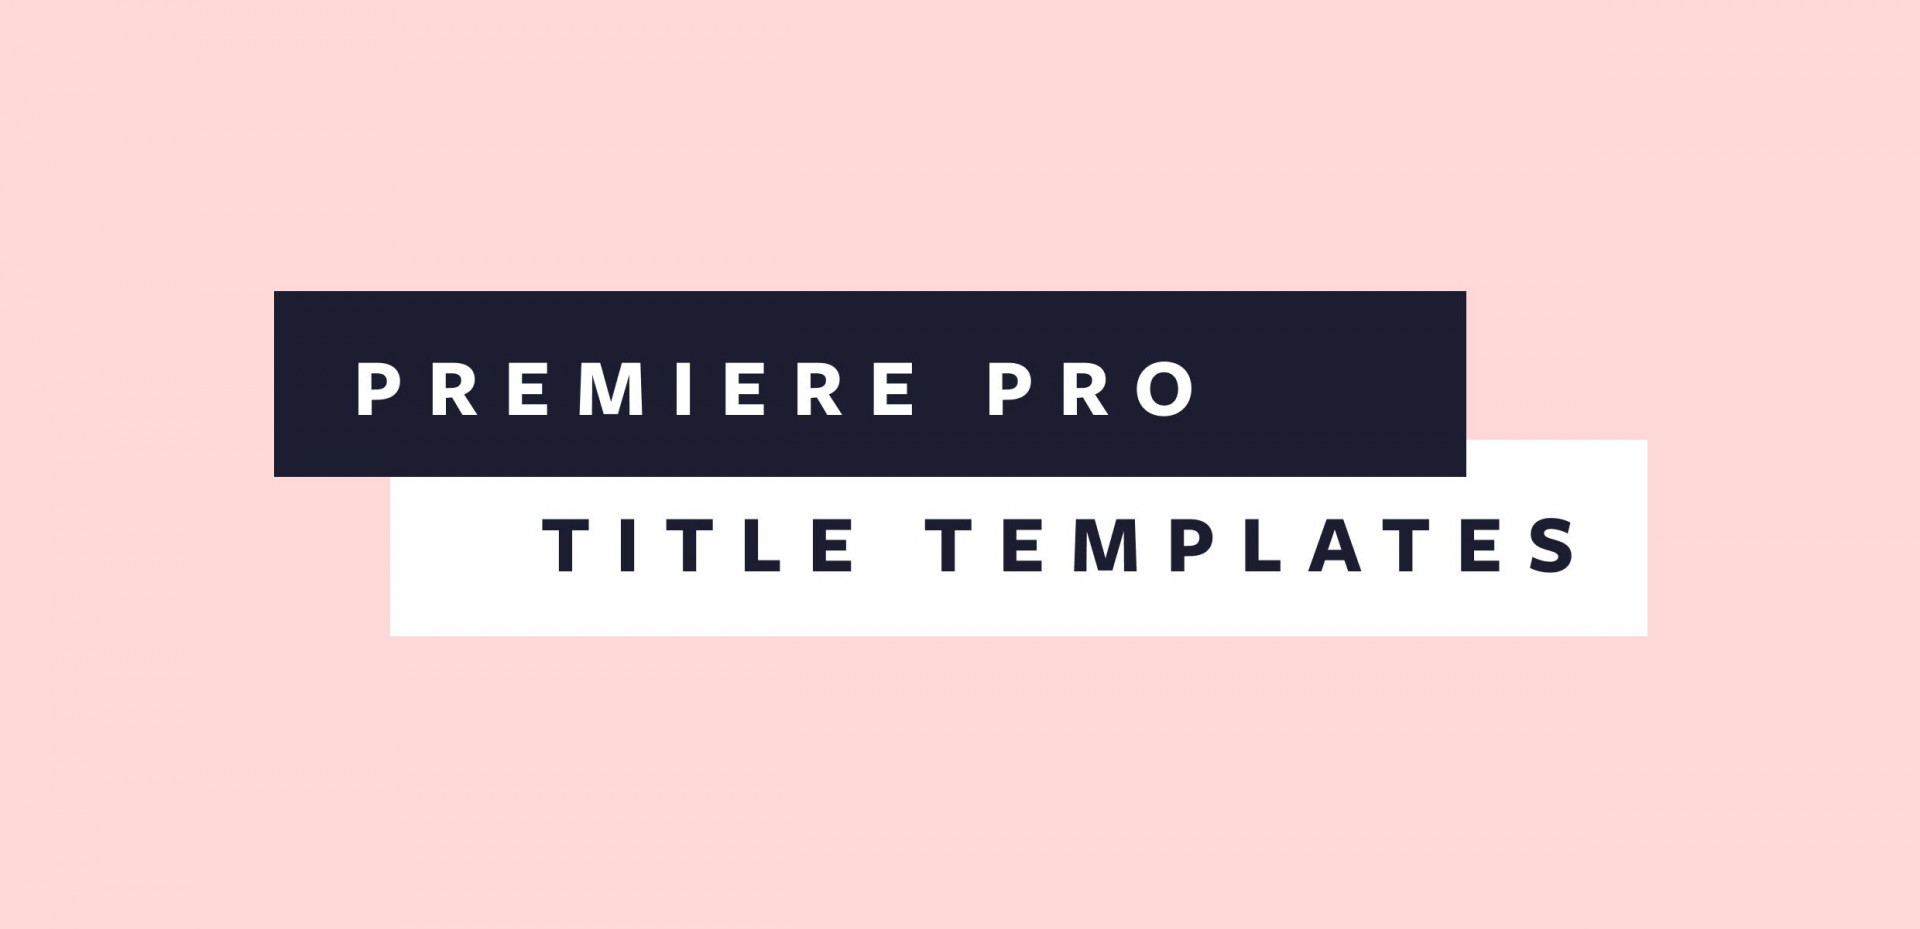 004 Unique Free Adobe Premiere Template Highest Clarity  Templates Pro Intro Rush Wedding Video1920